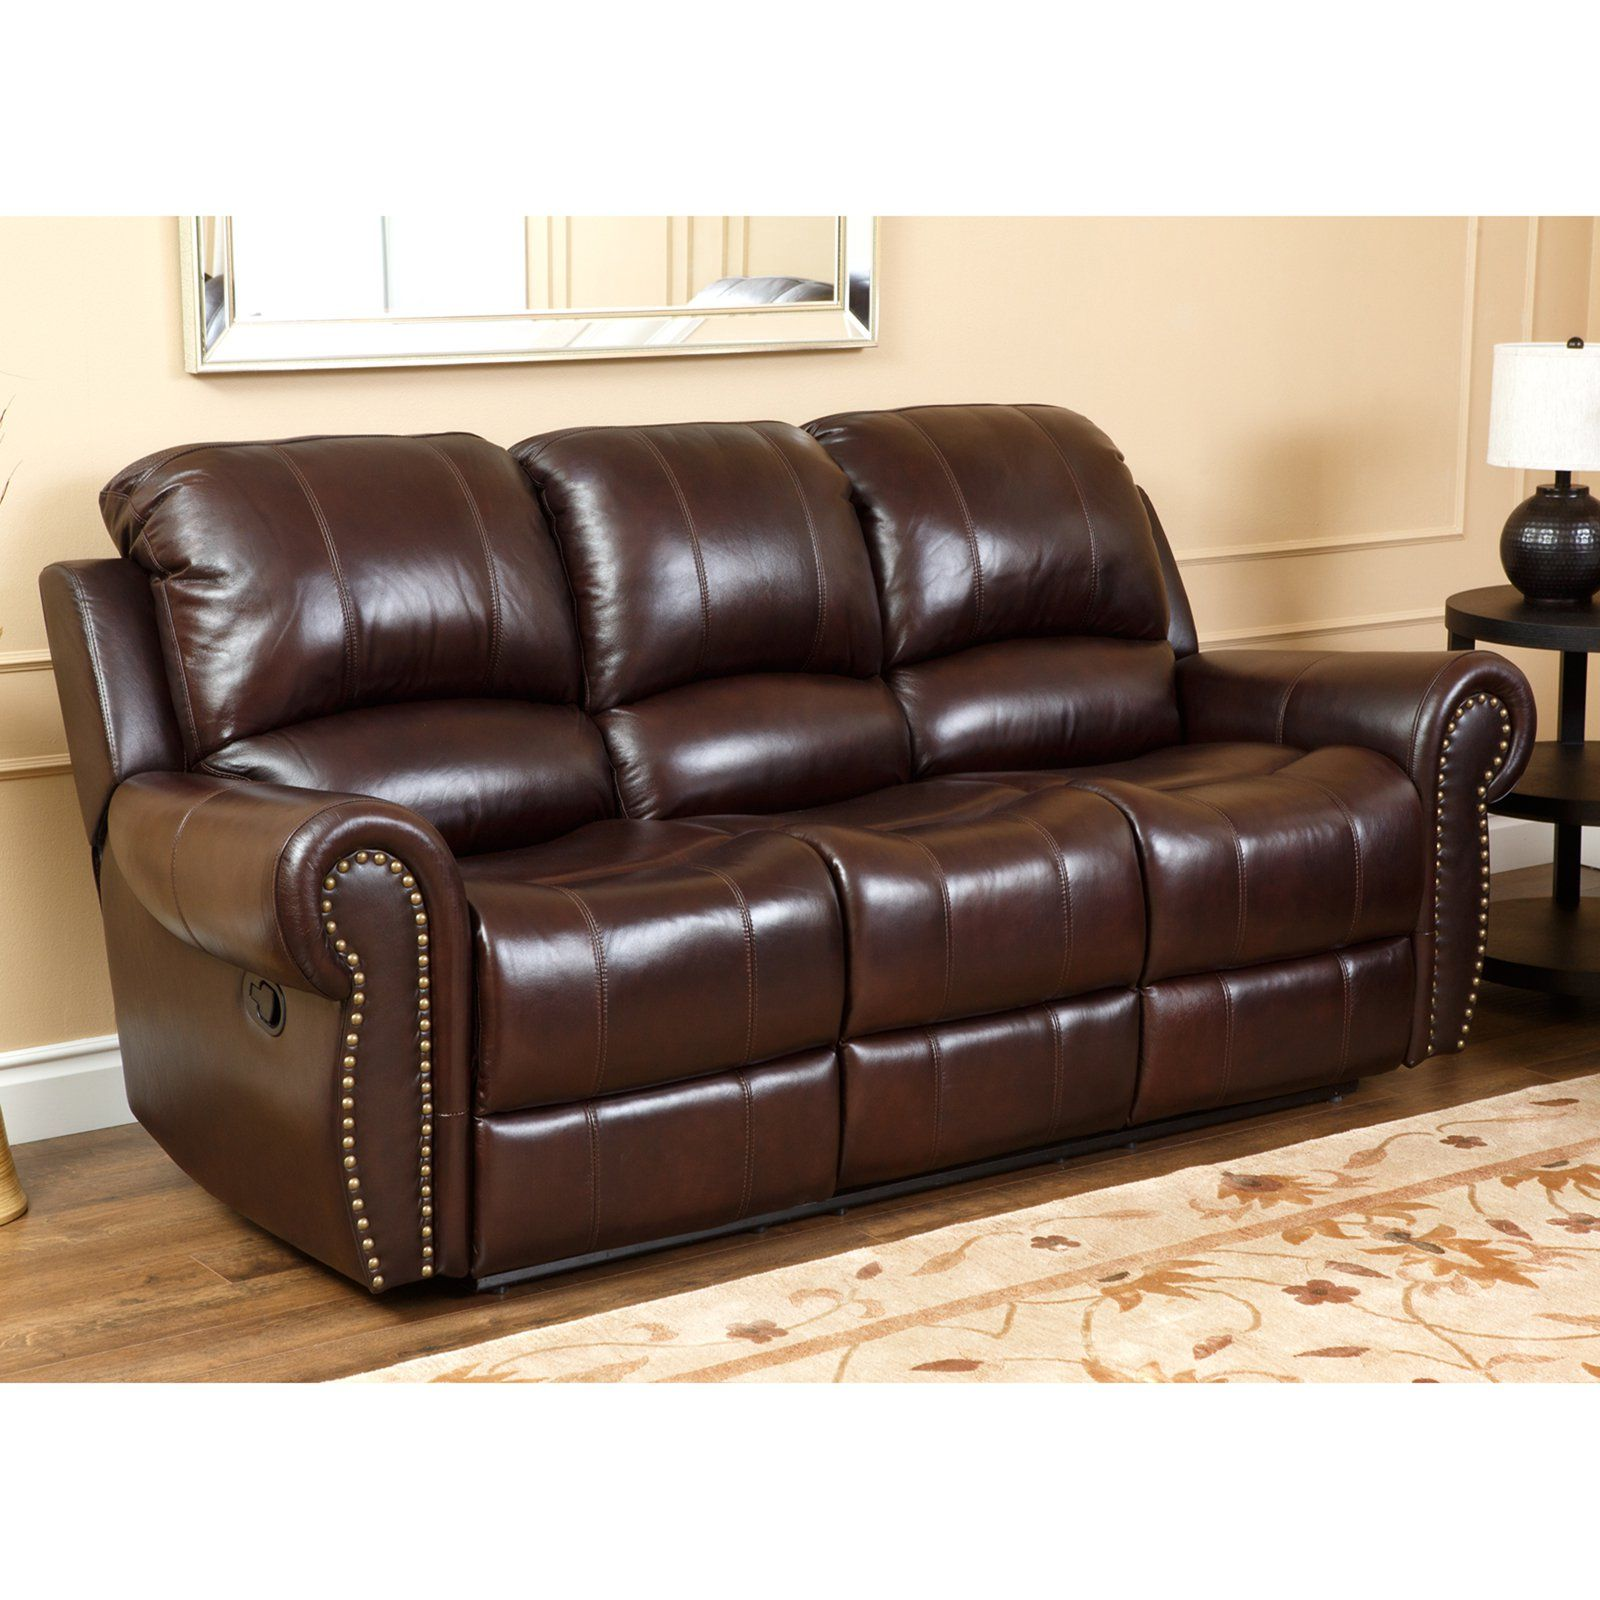 Pin By Sofacouchs On Microfiber Sofa Italian Leather Sofa Full